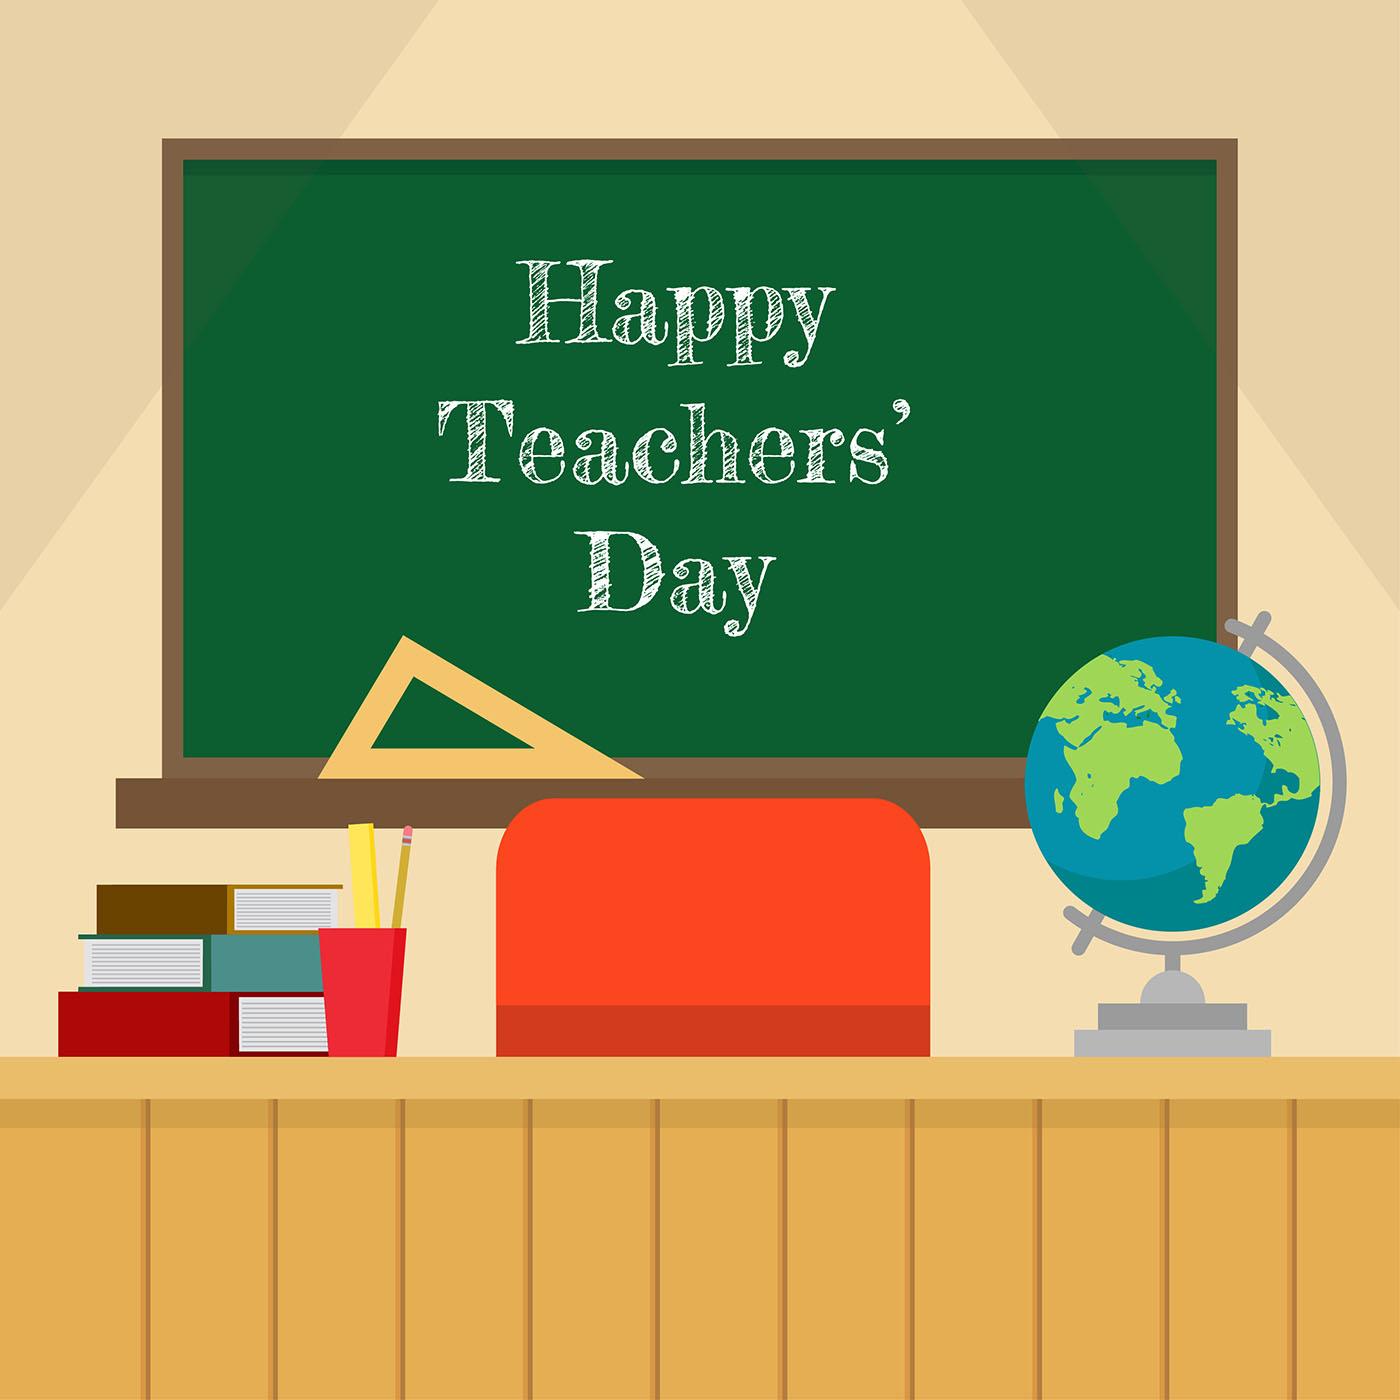 Teachers Day Classroom Vector  Download Free Vector Art Stock Graphics  Images